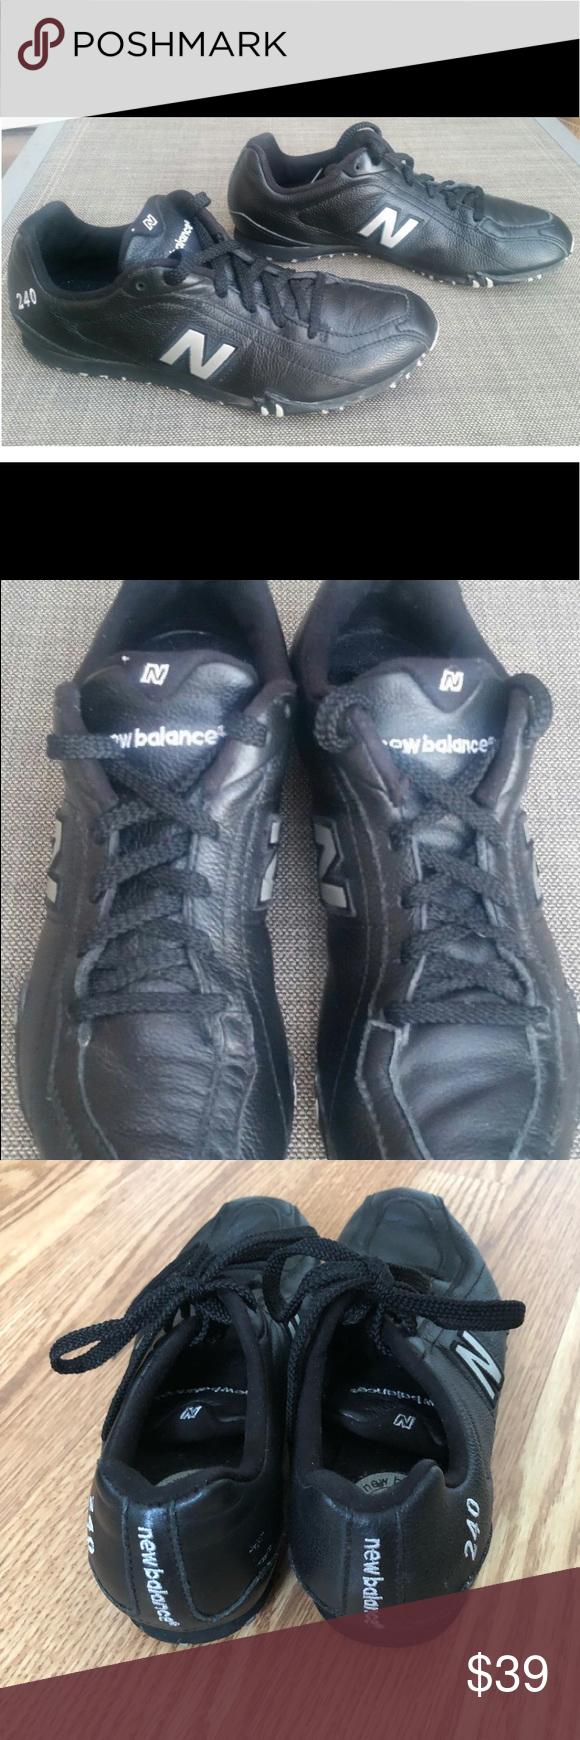 Black running shoes, New balance women